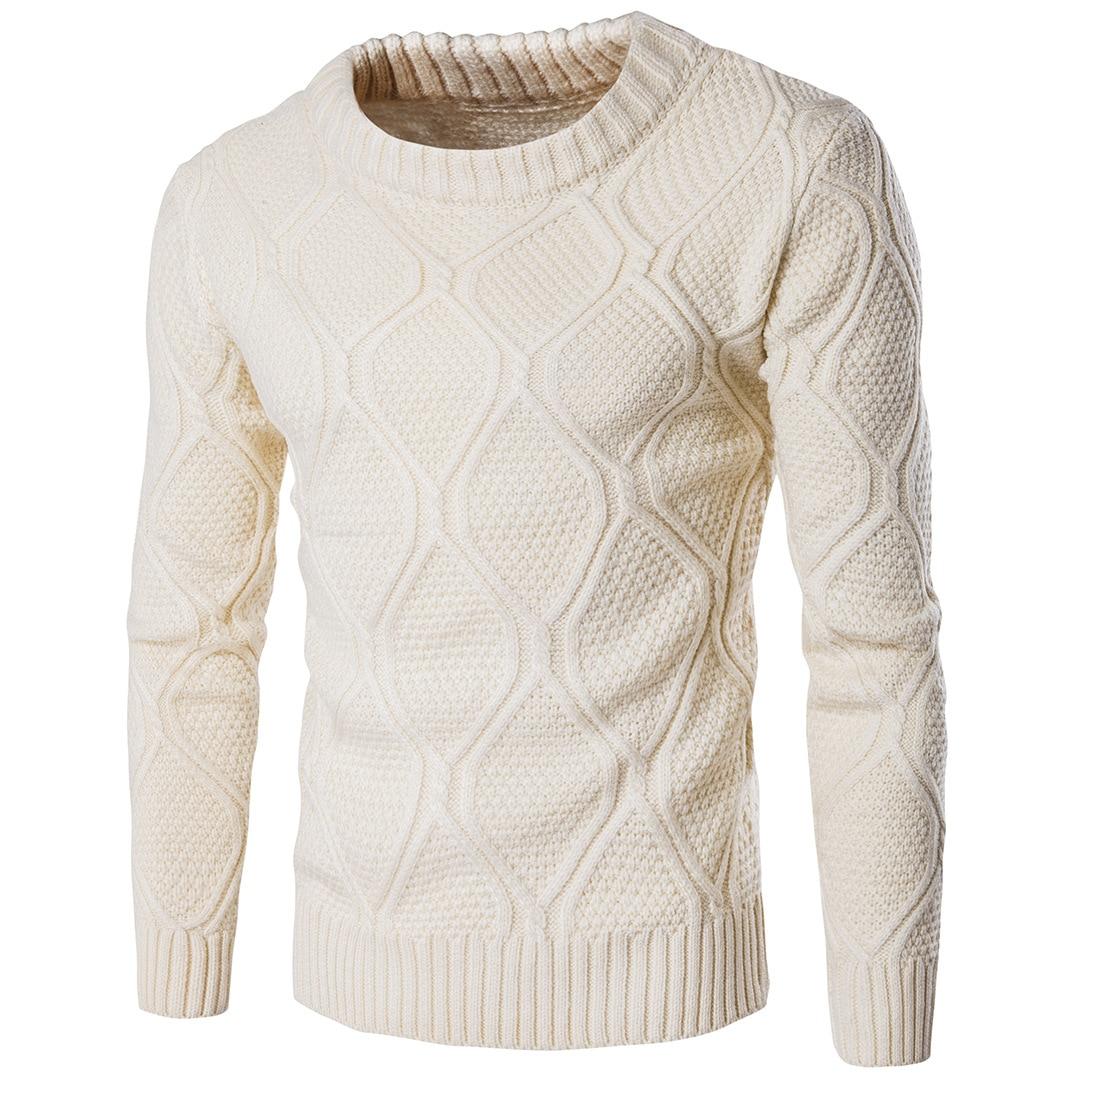 2018 Autumn Men's Casual Pullover Wool Sweater , Warm Winter Men's Round Neck Solid Sweater Men , Fashion Twist Knit Sweater